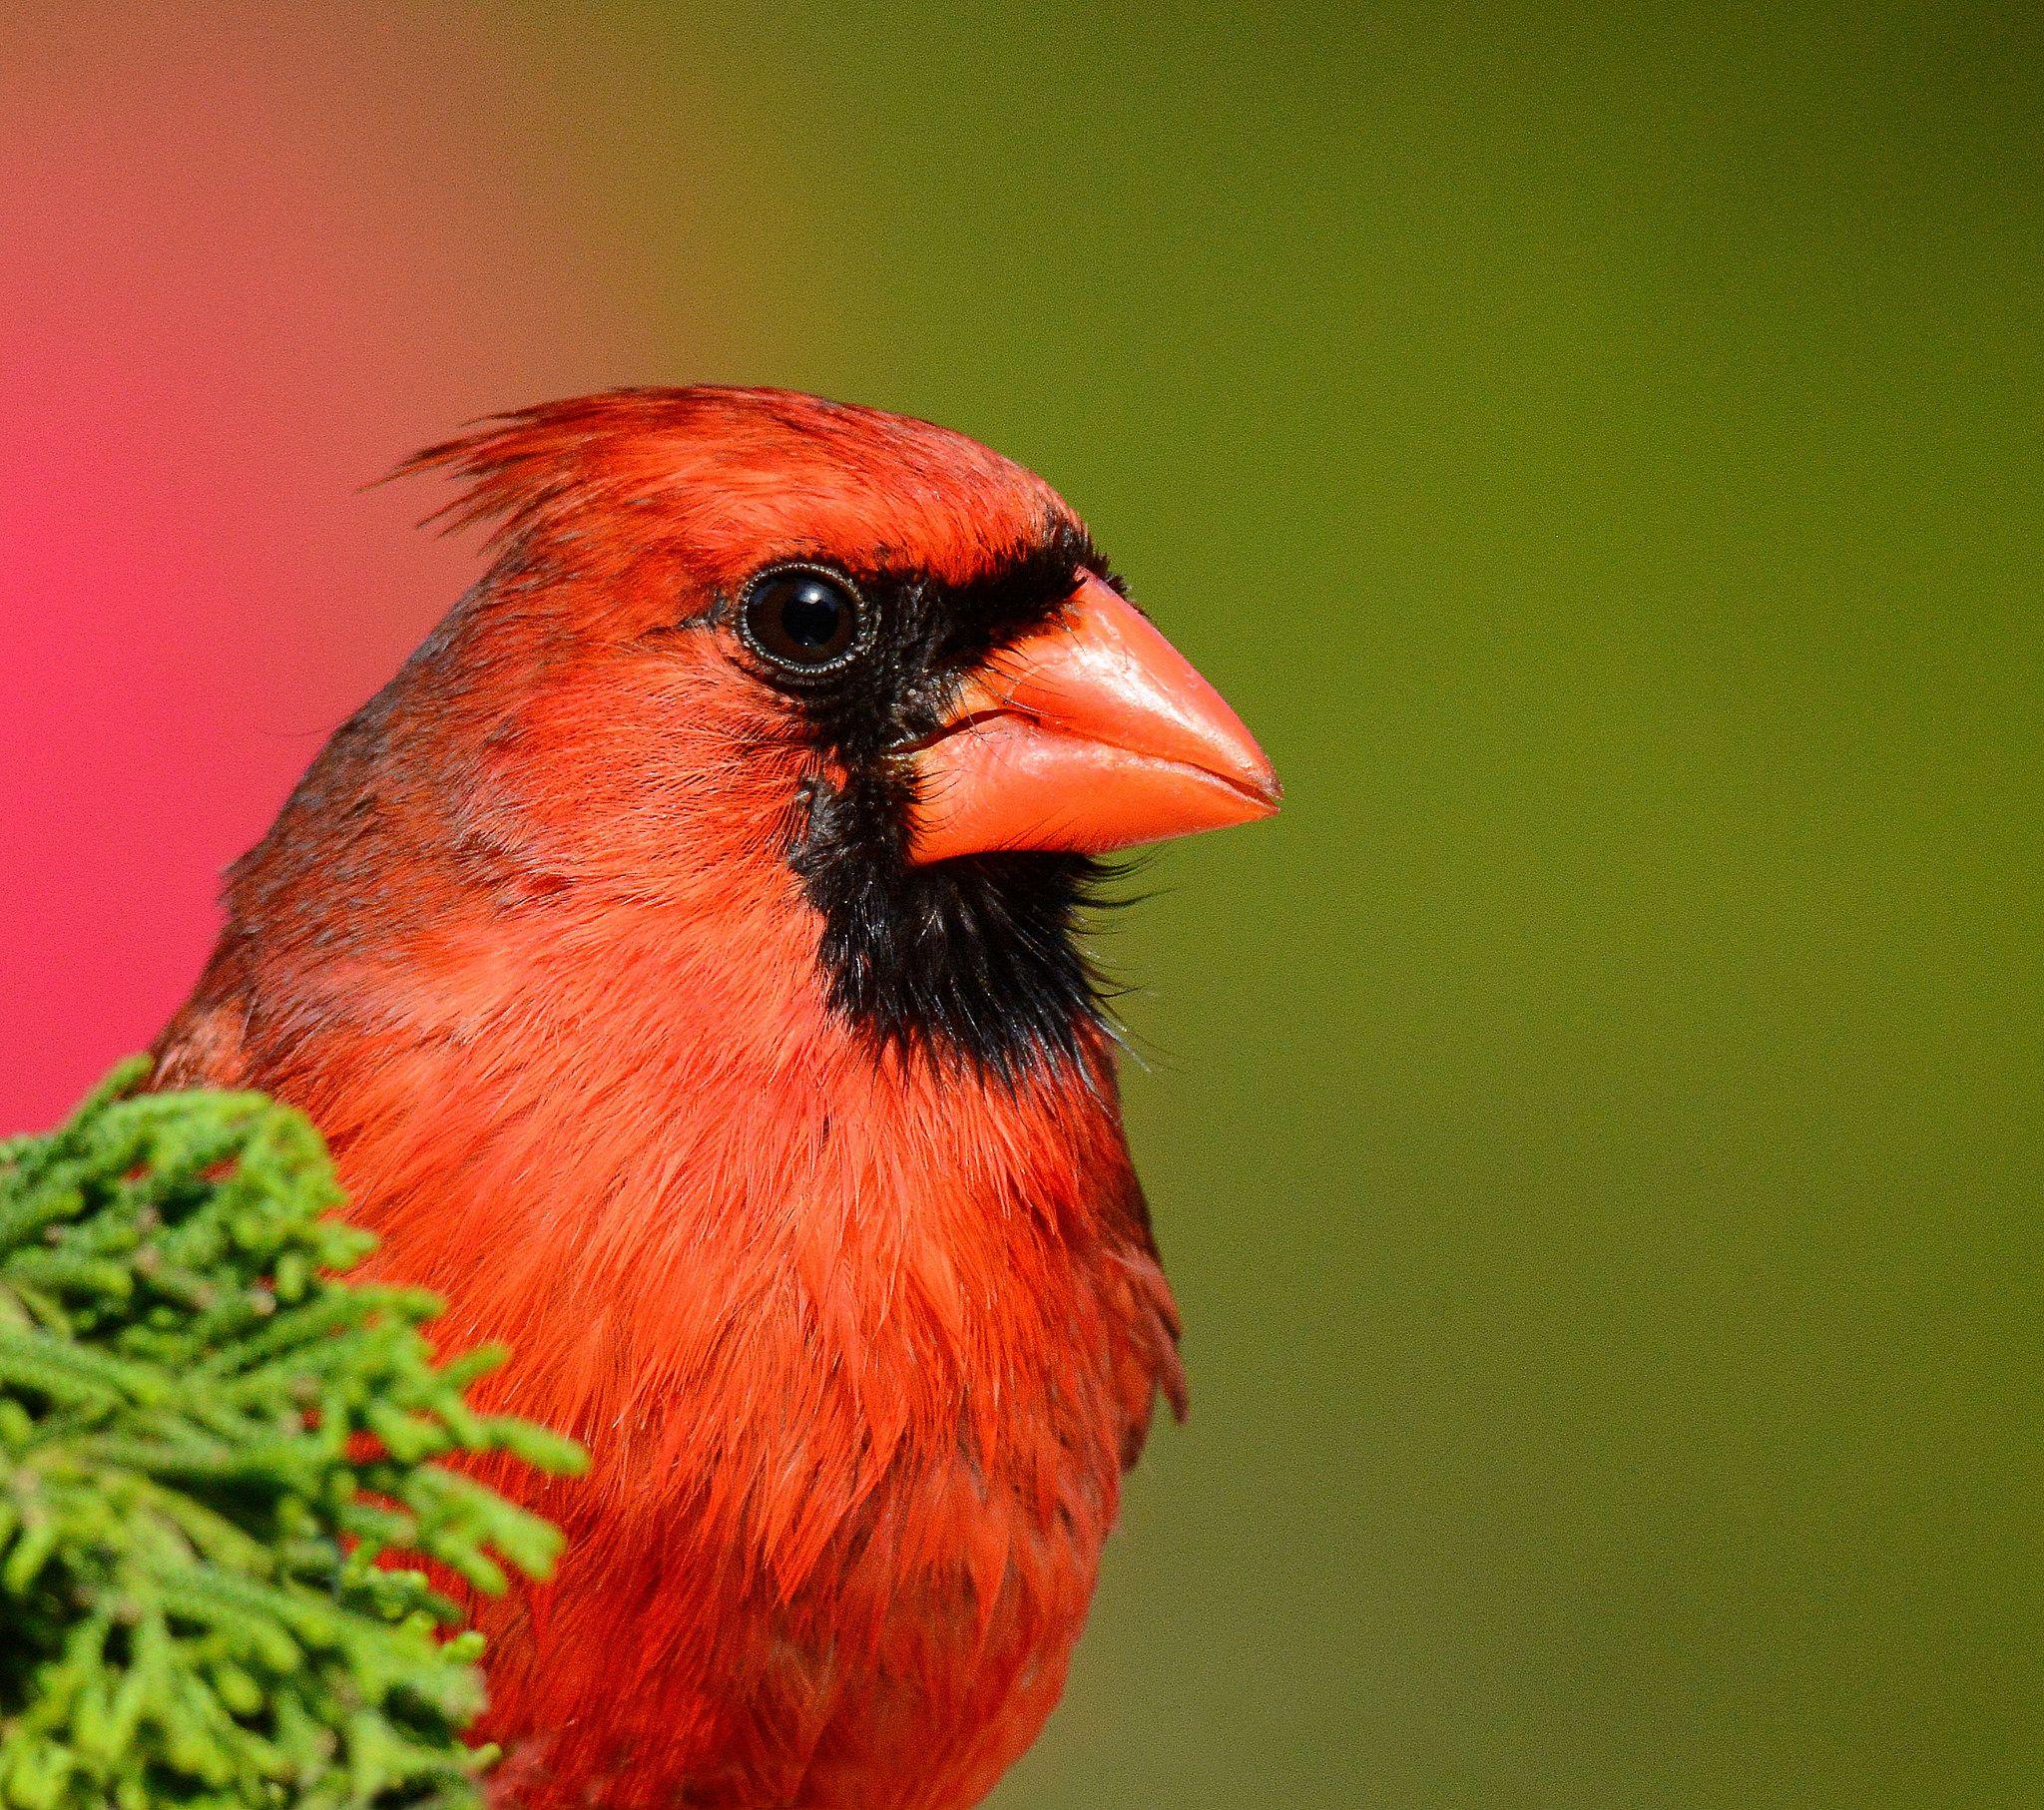 https://flic.kr/p/nF7JF2 | Male Cardinal | Baldwin, NY - May 19, 2014